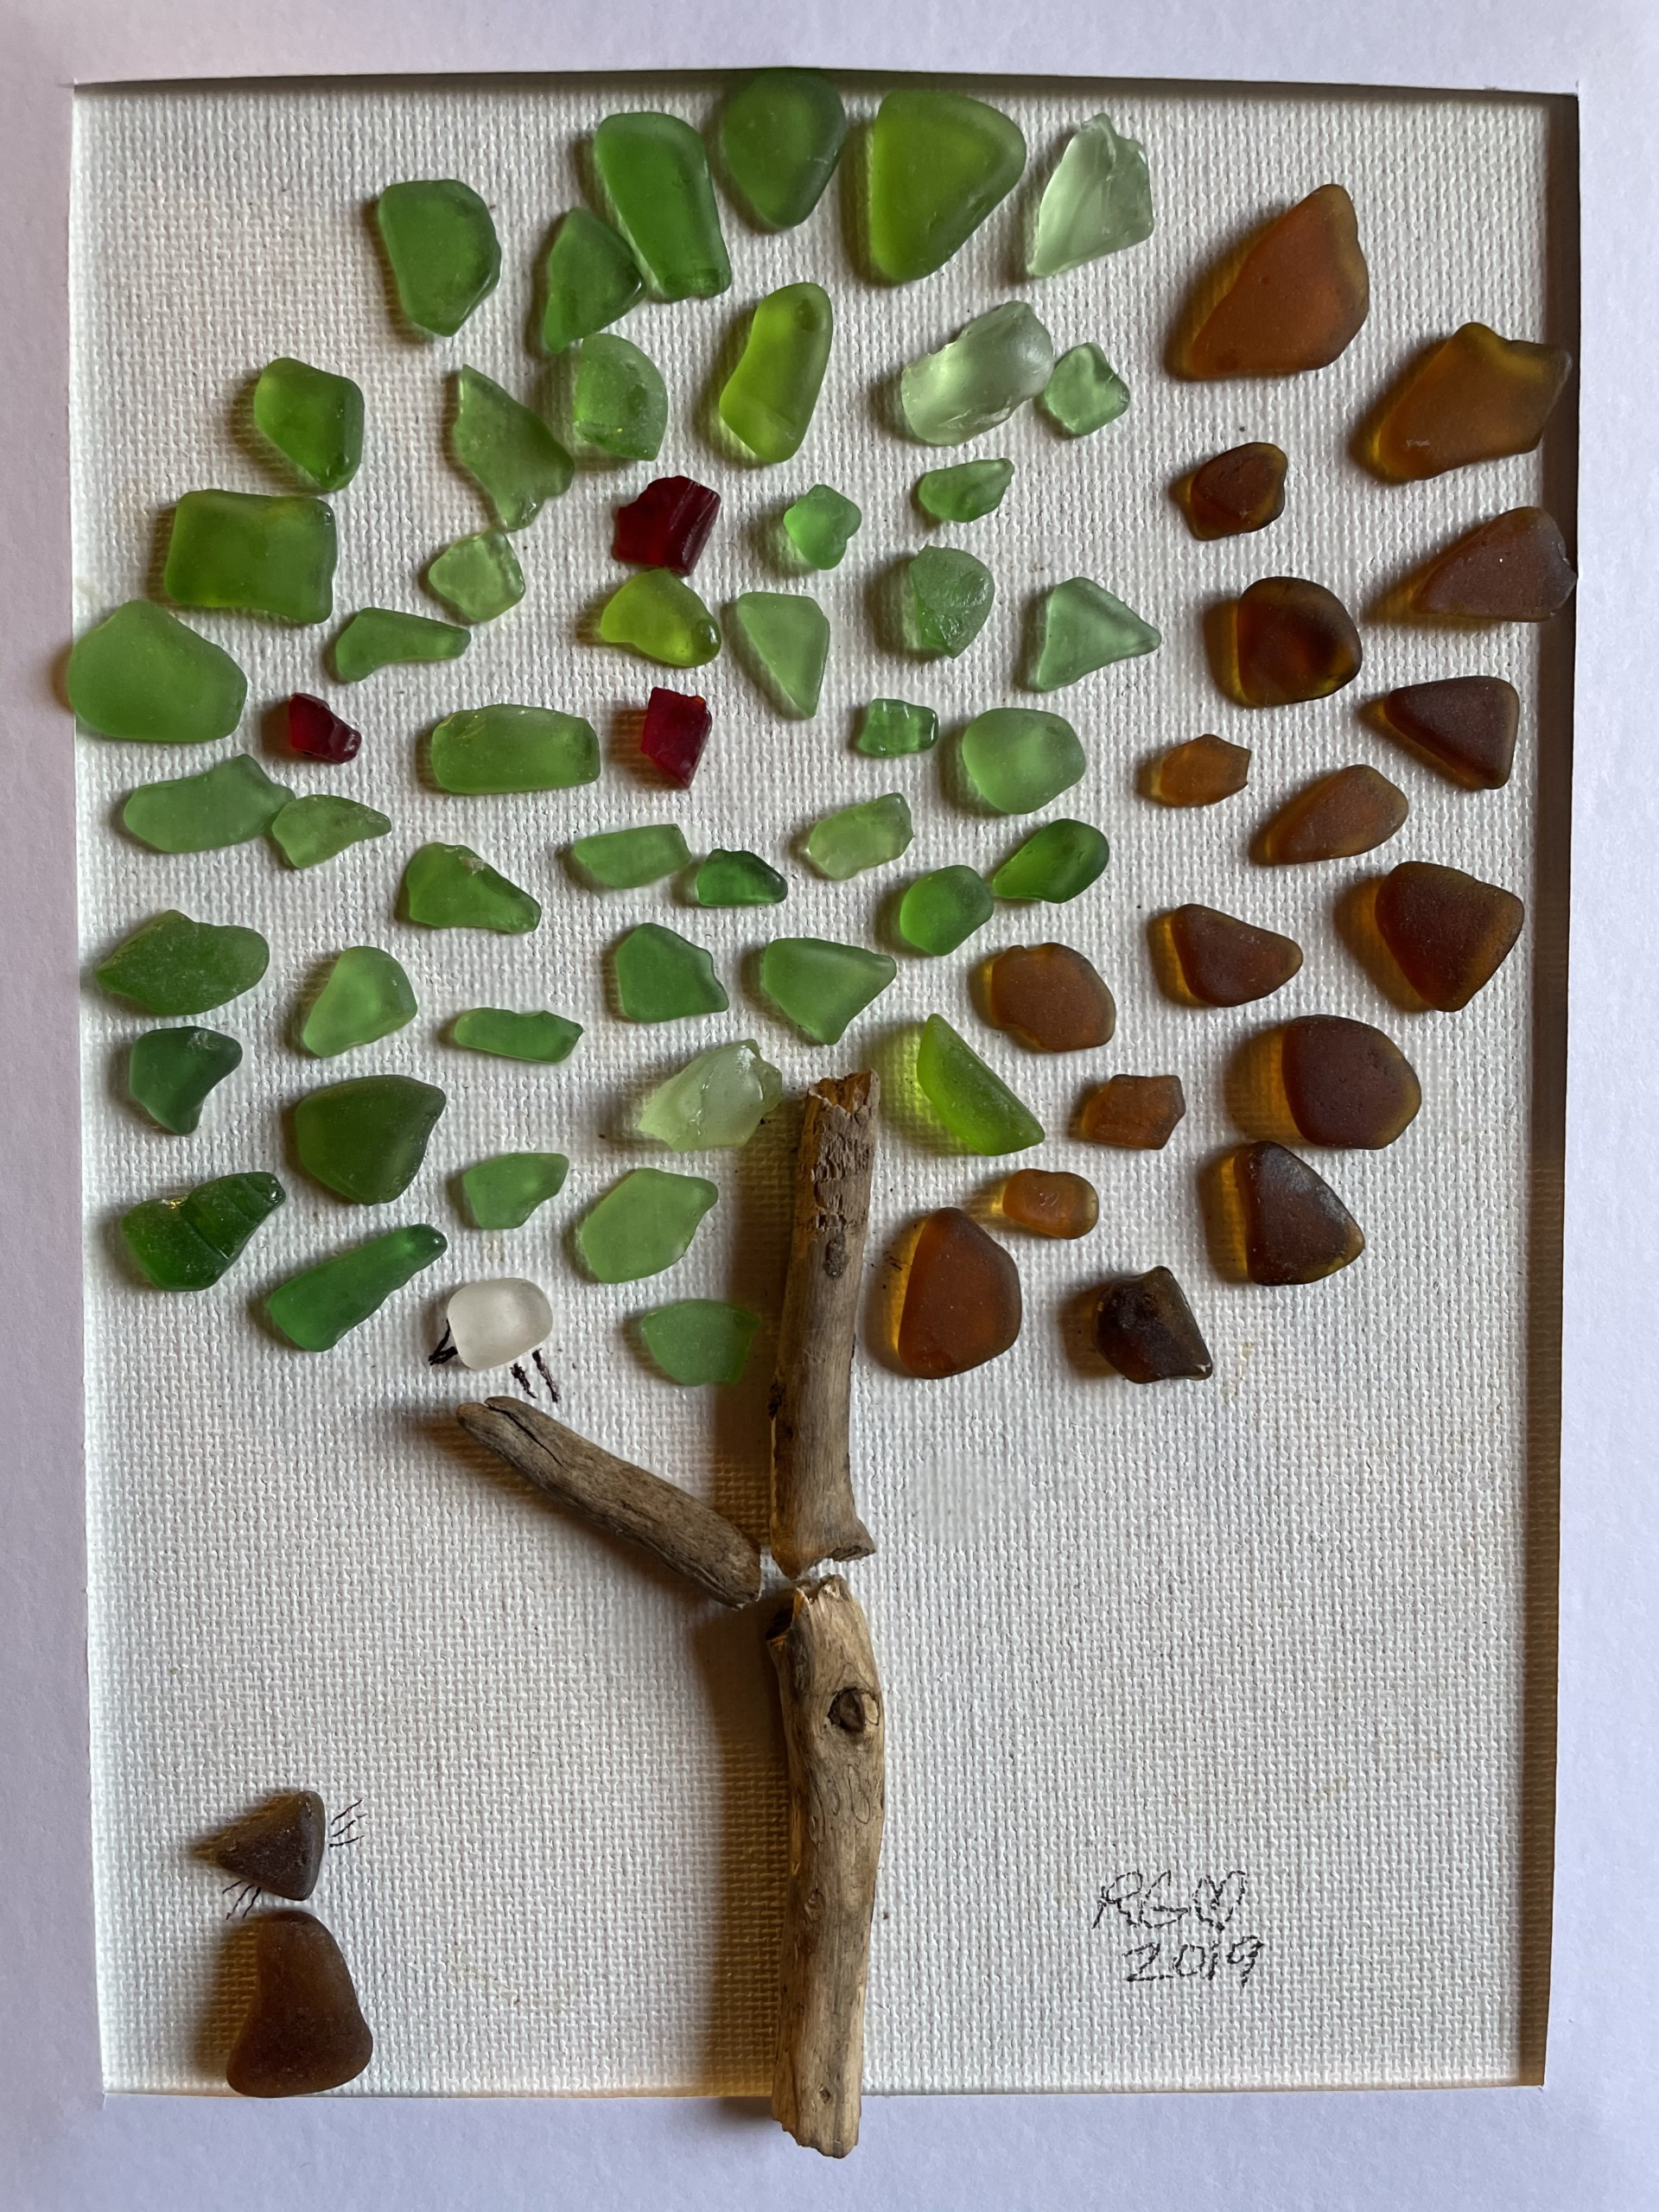 The Apple Tree - Rain Greenslate